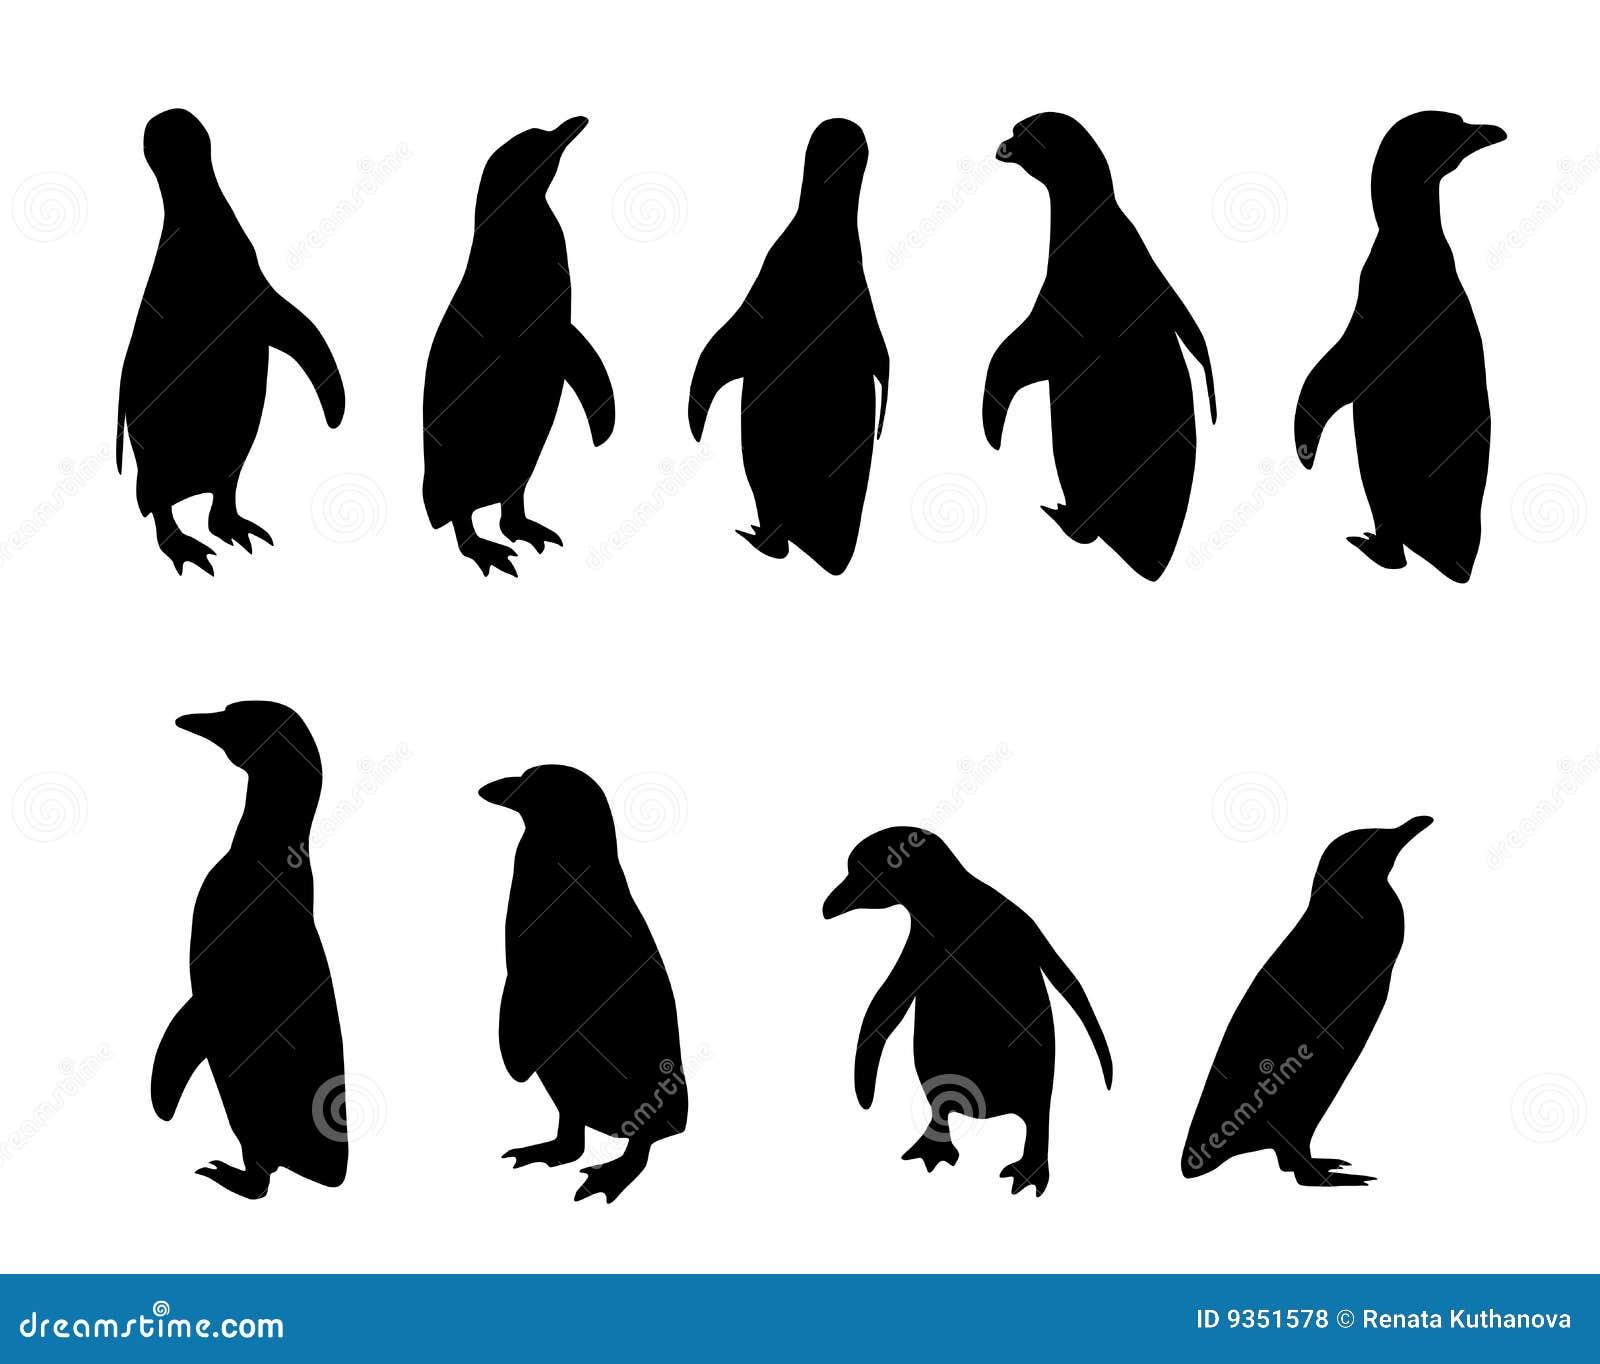 penguin silhouettes stock vector illustration of animal